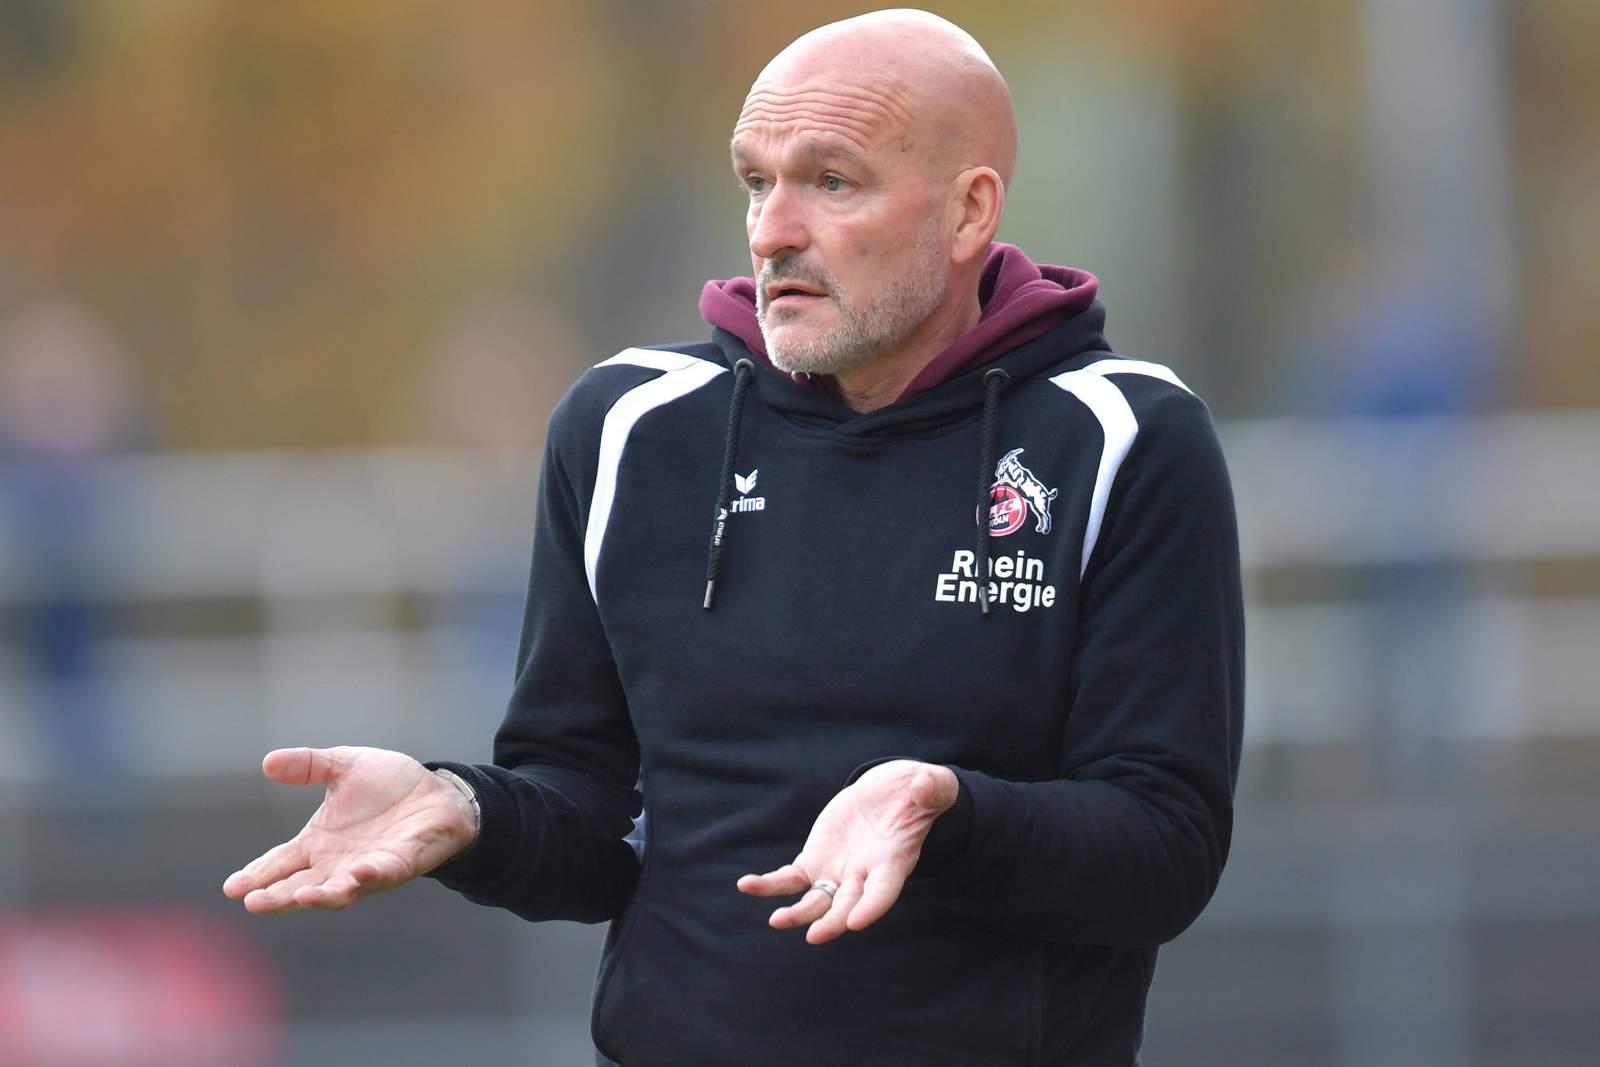 Debüt in Bremen: RWE-Trainer Stefan Emmerling